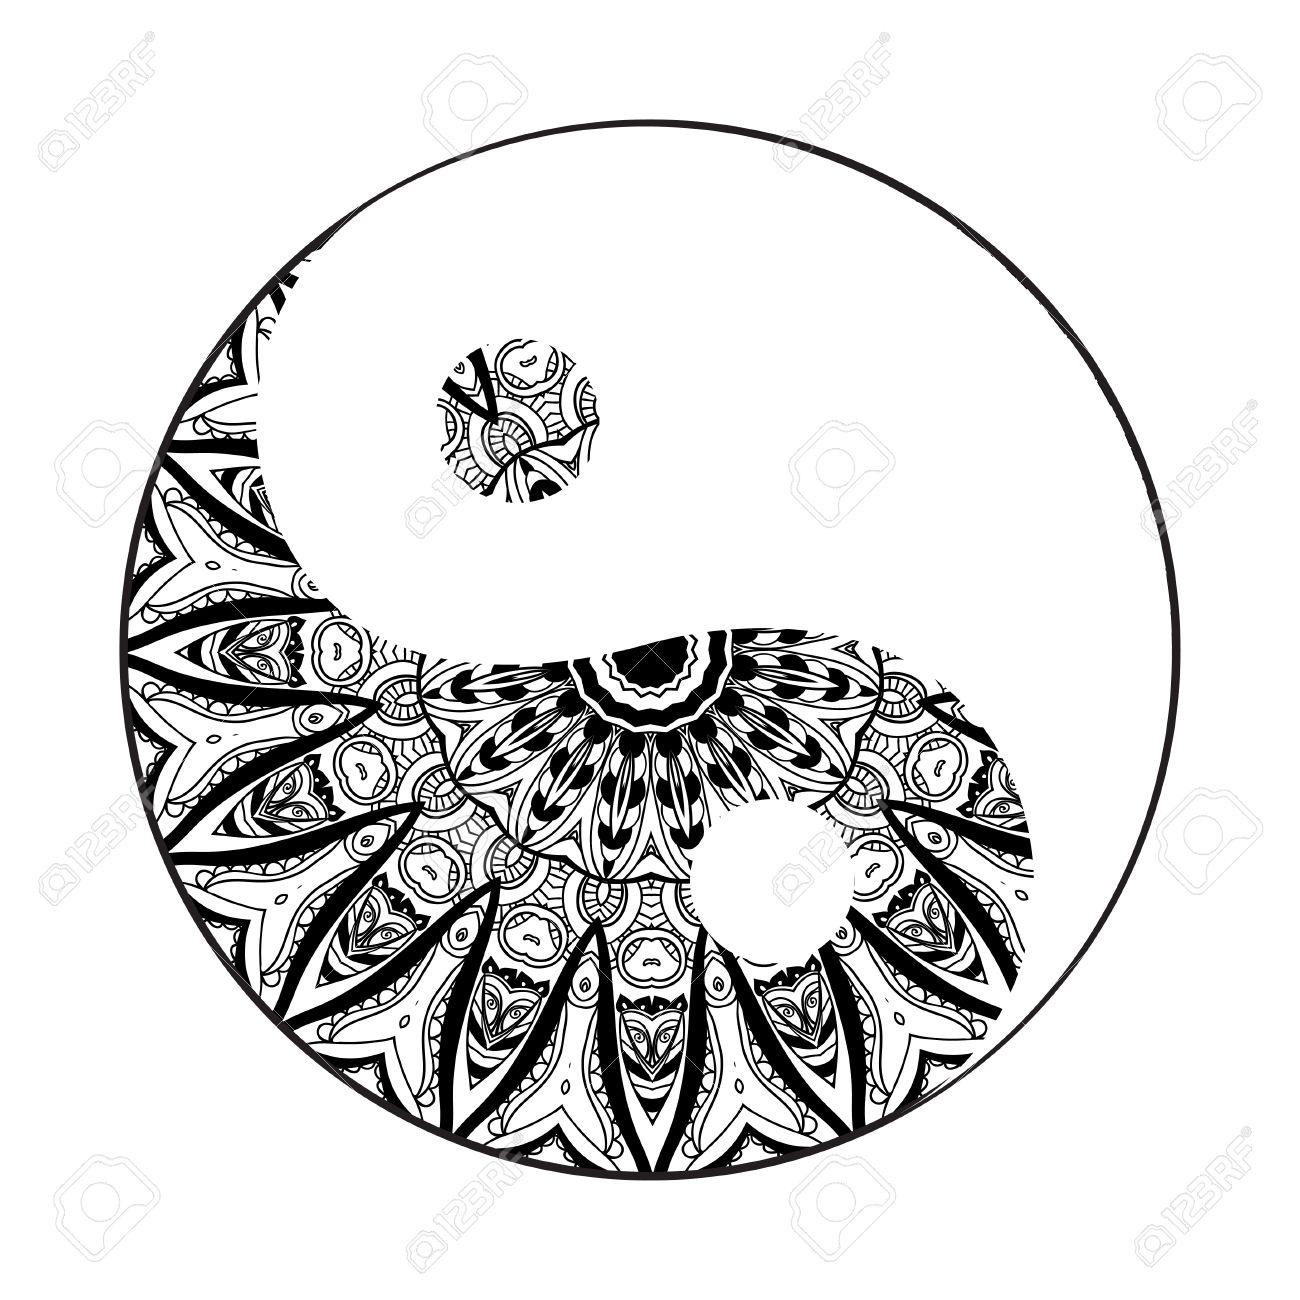 1300x1300 Ornament Card With Mandala Yin Yang. Geometric Circle Element Made